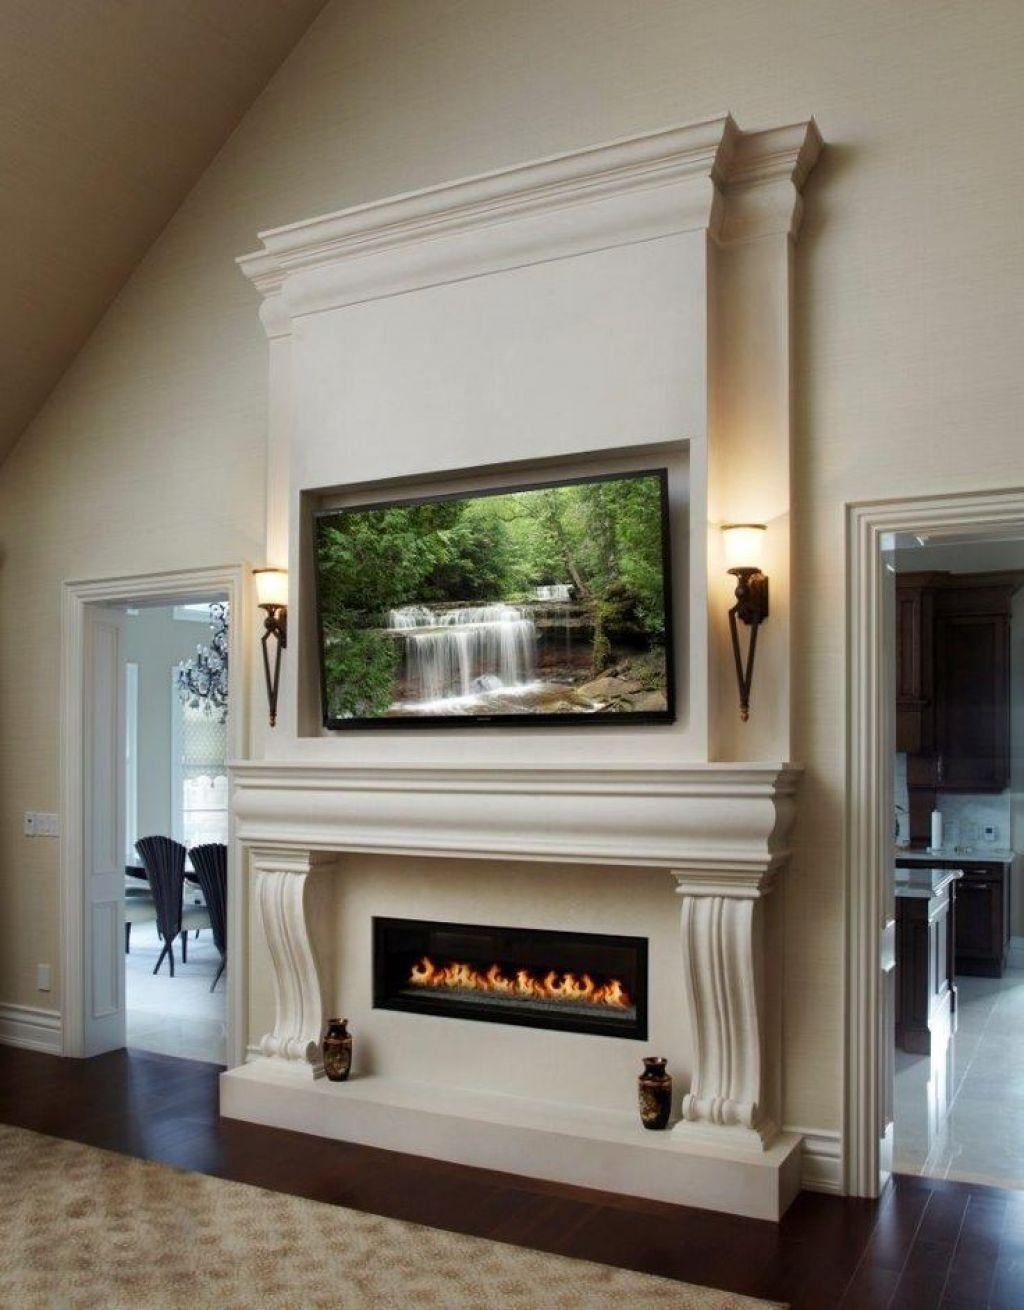 precast fireplace mantel under mounted lcd tv in 2019 home ideas rh pinterest com  precast stone fireplace mantels